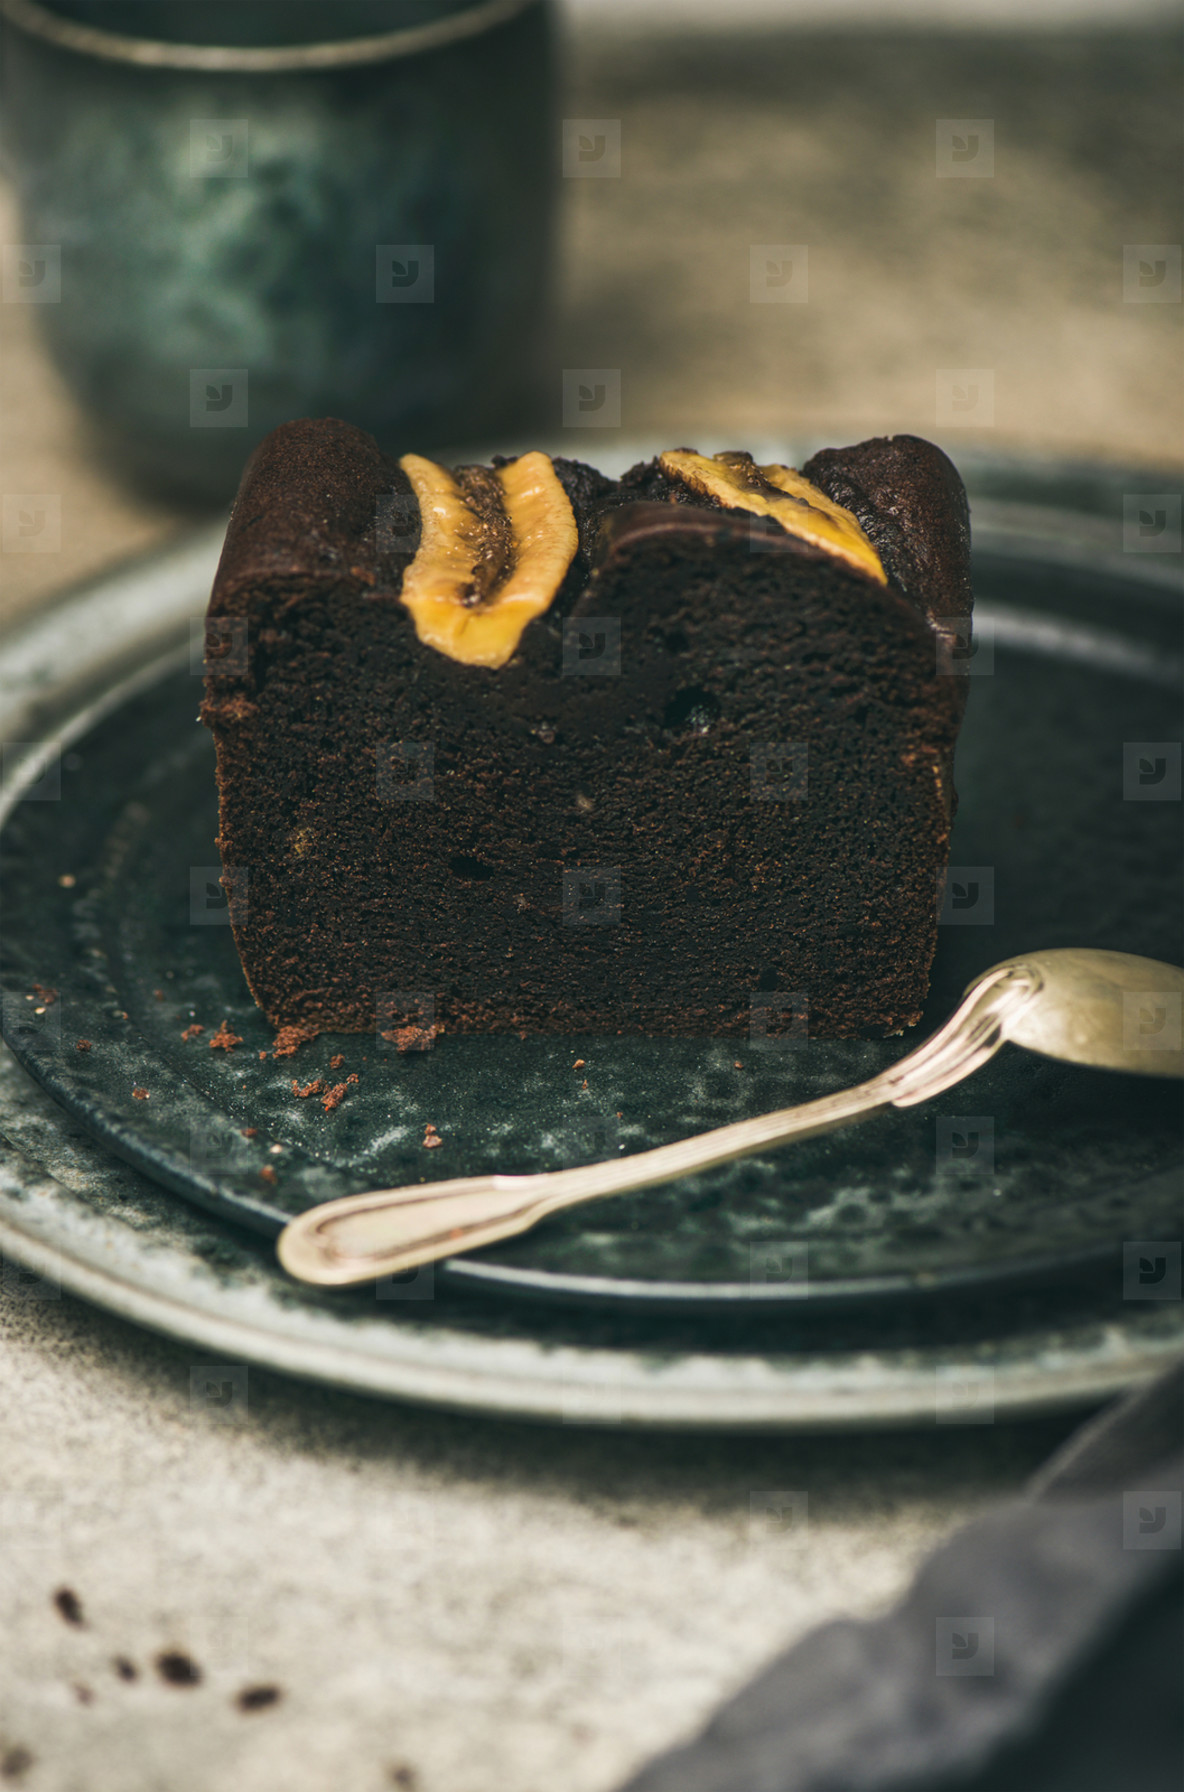 Piece of dark chocolate banana bread cake on grey plate